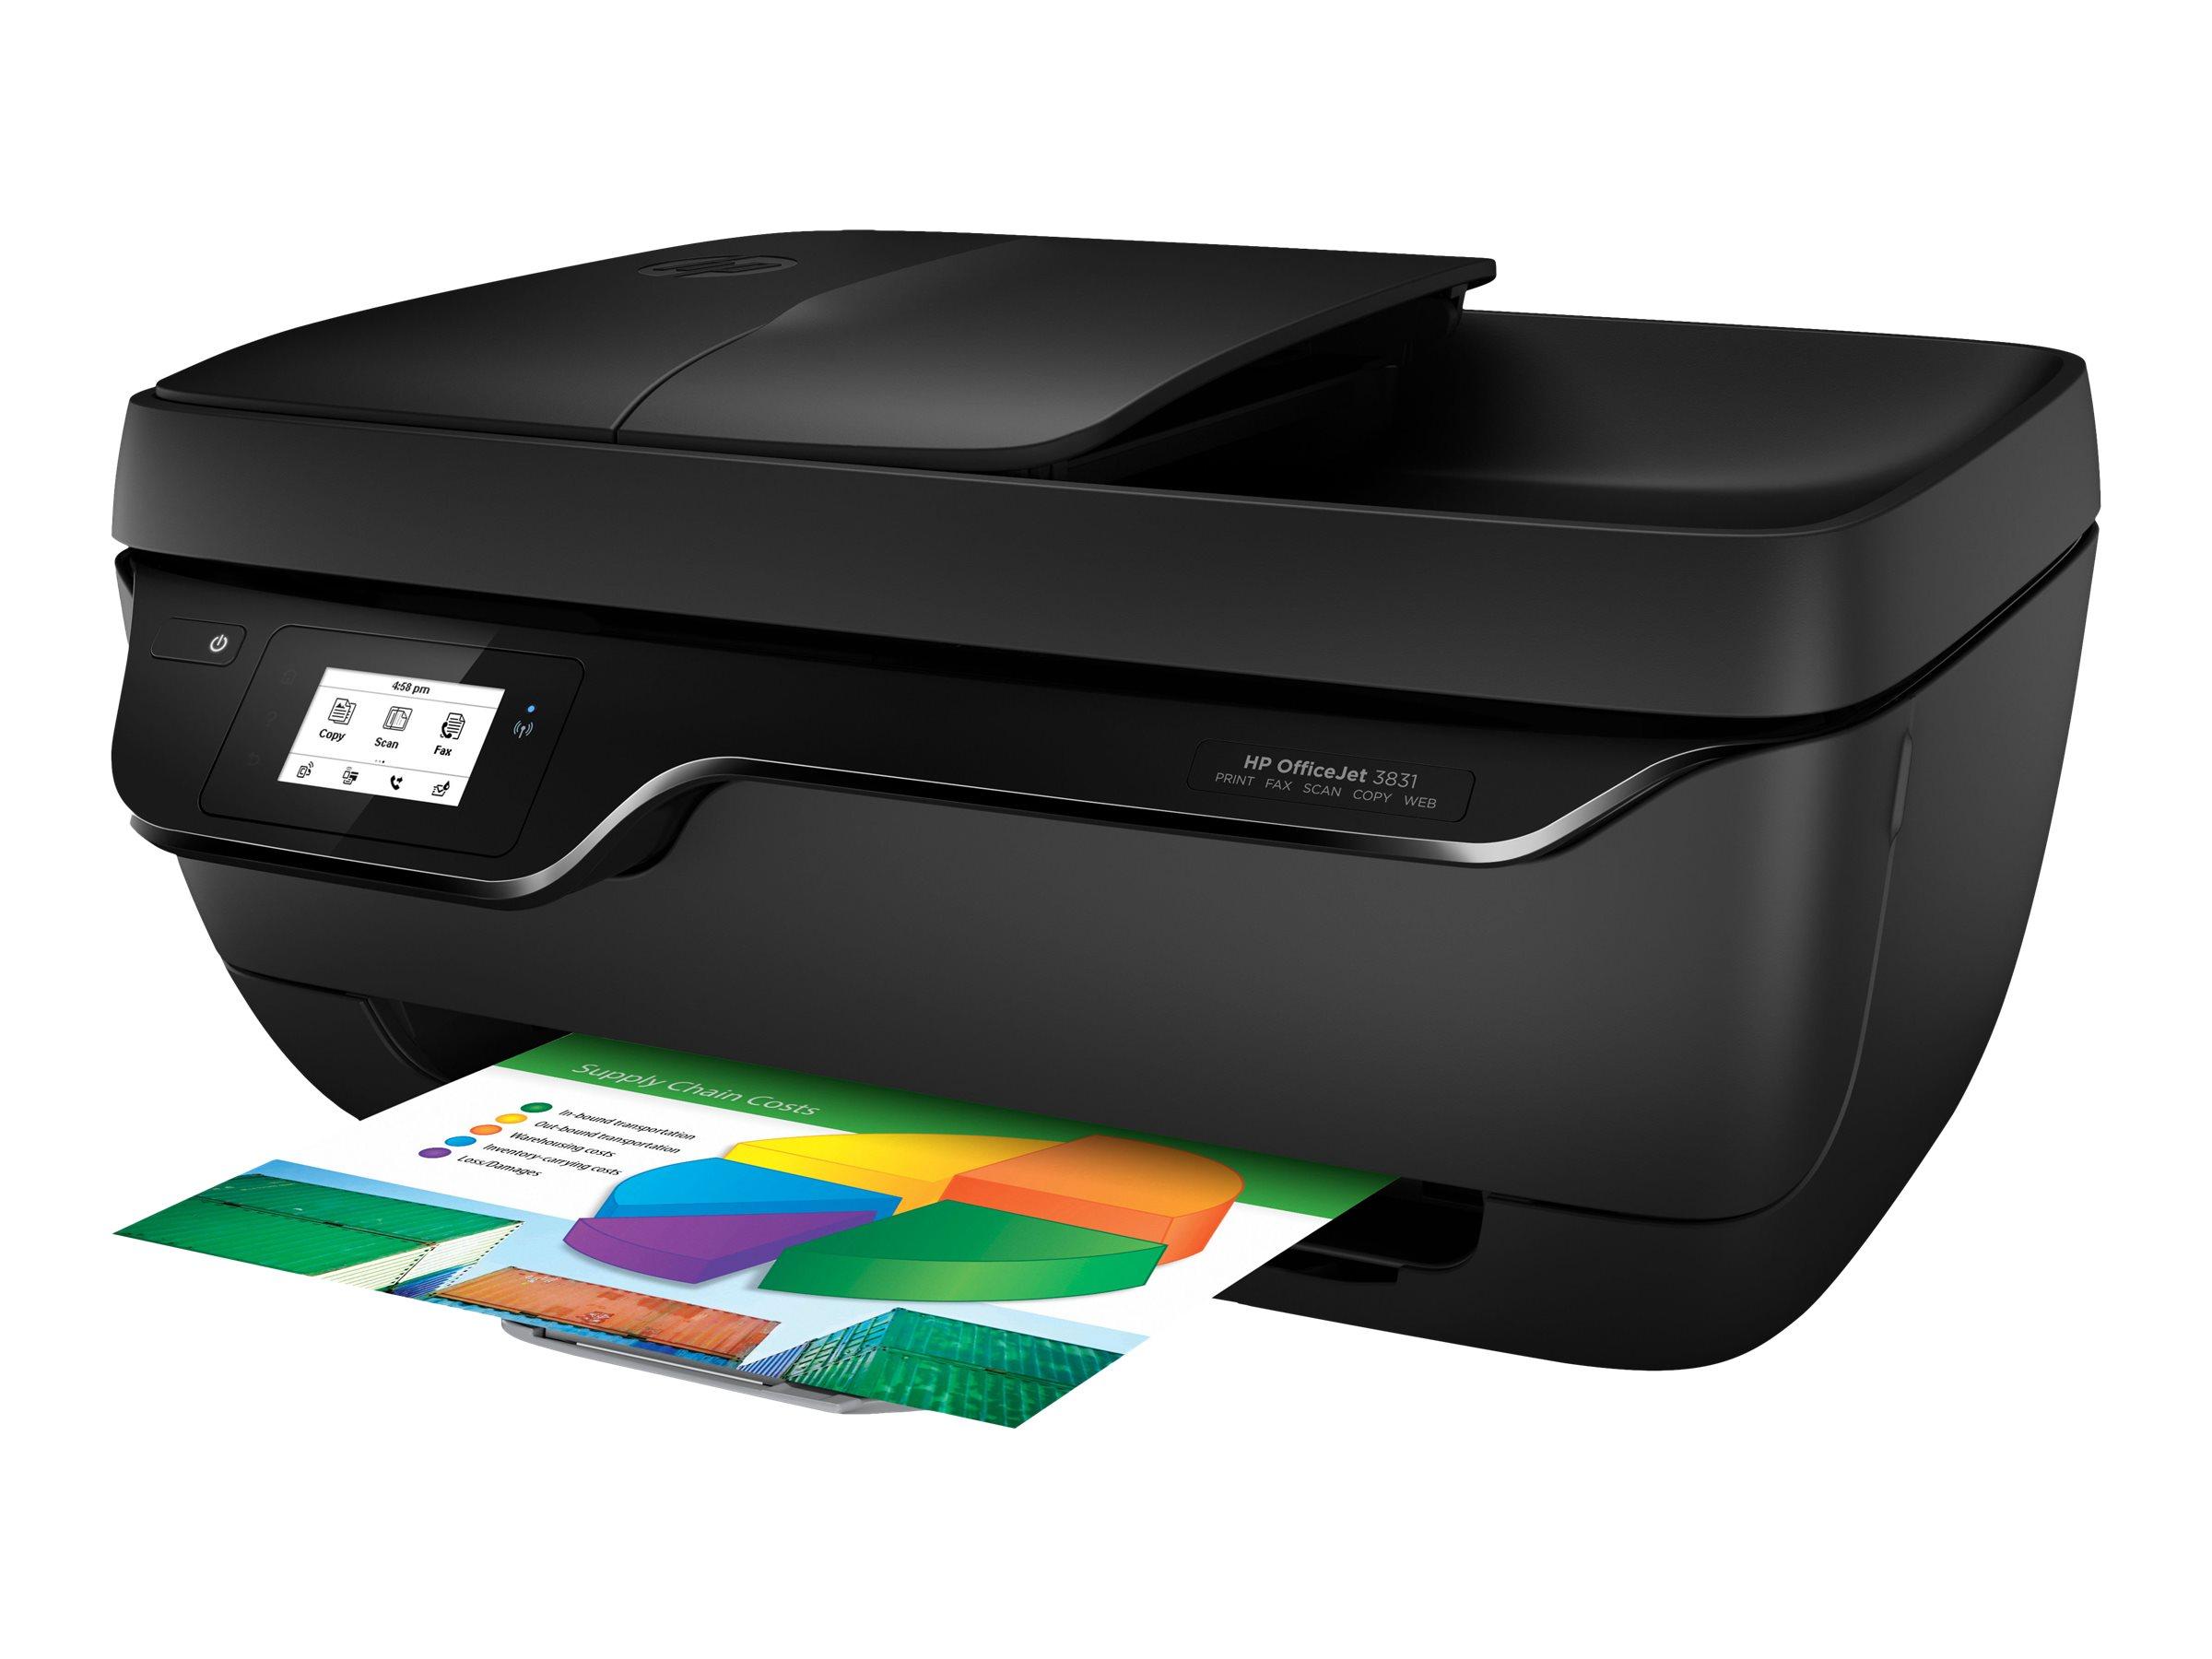 HP Officejet 3831 All-in-One - Multifunktionsdrucker - Farbe - Tintenstrahl - 216 x 297 mm (Original)